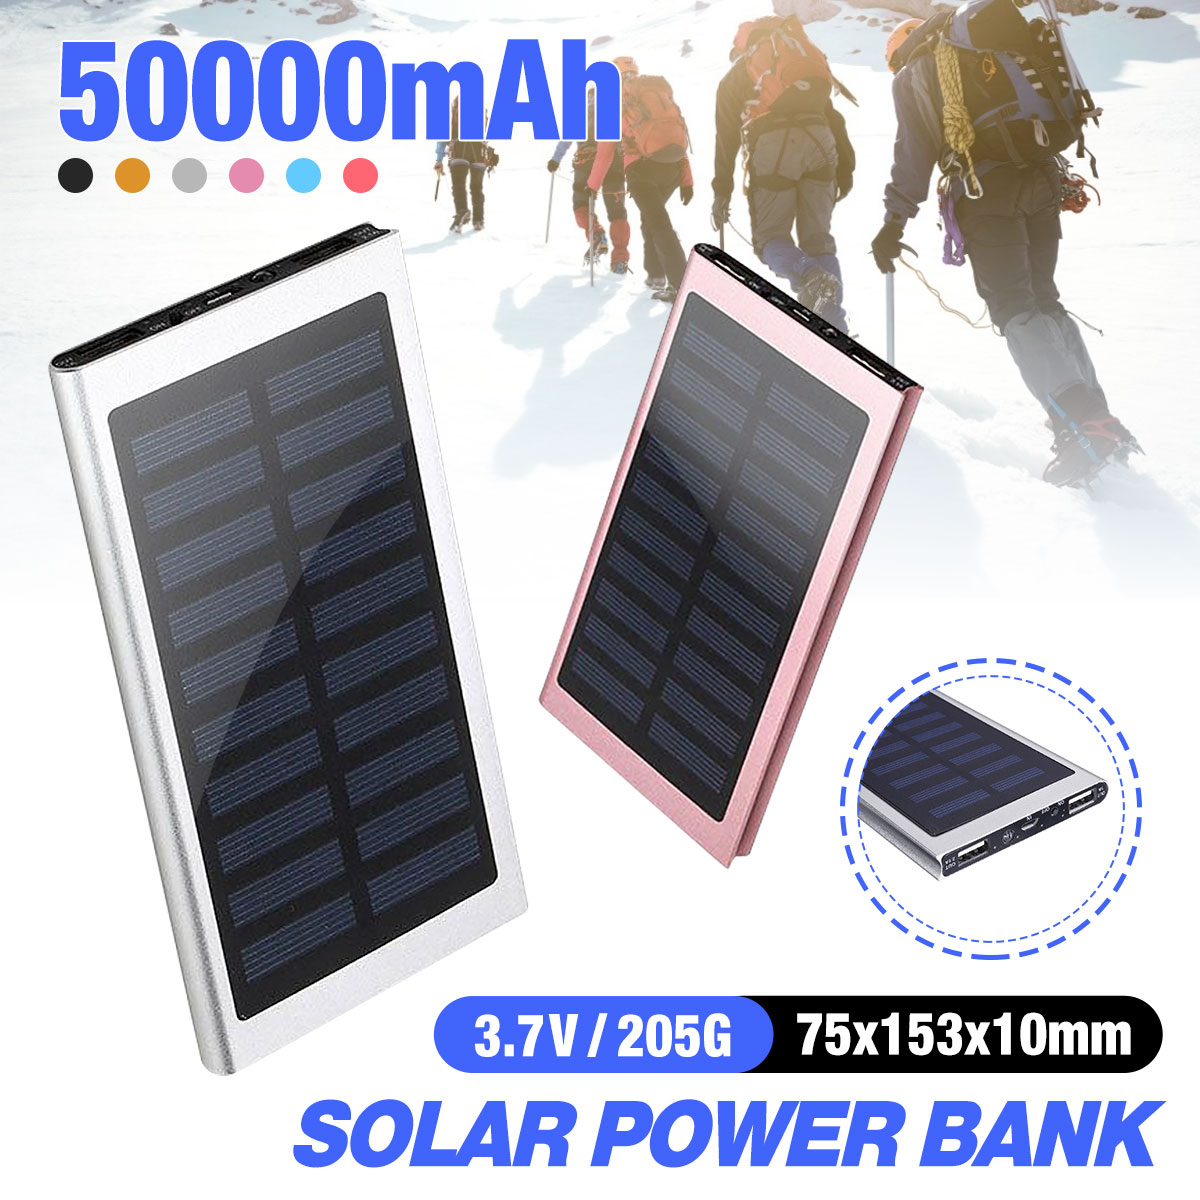 Portable Power Bank 50000mah External Battery 2 USB LED Powerbank Mobile phone Solar Charger